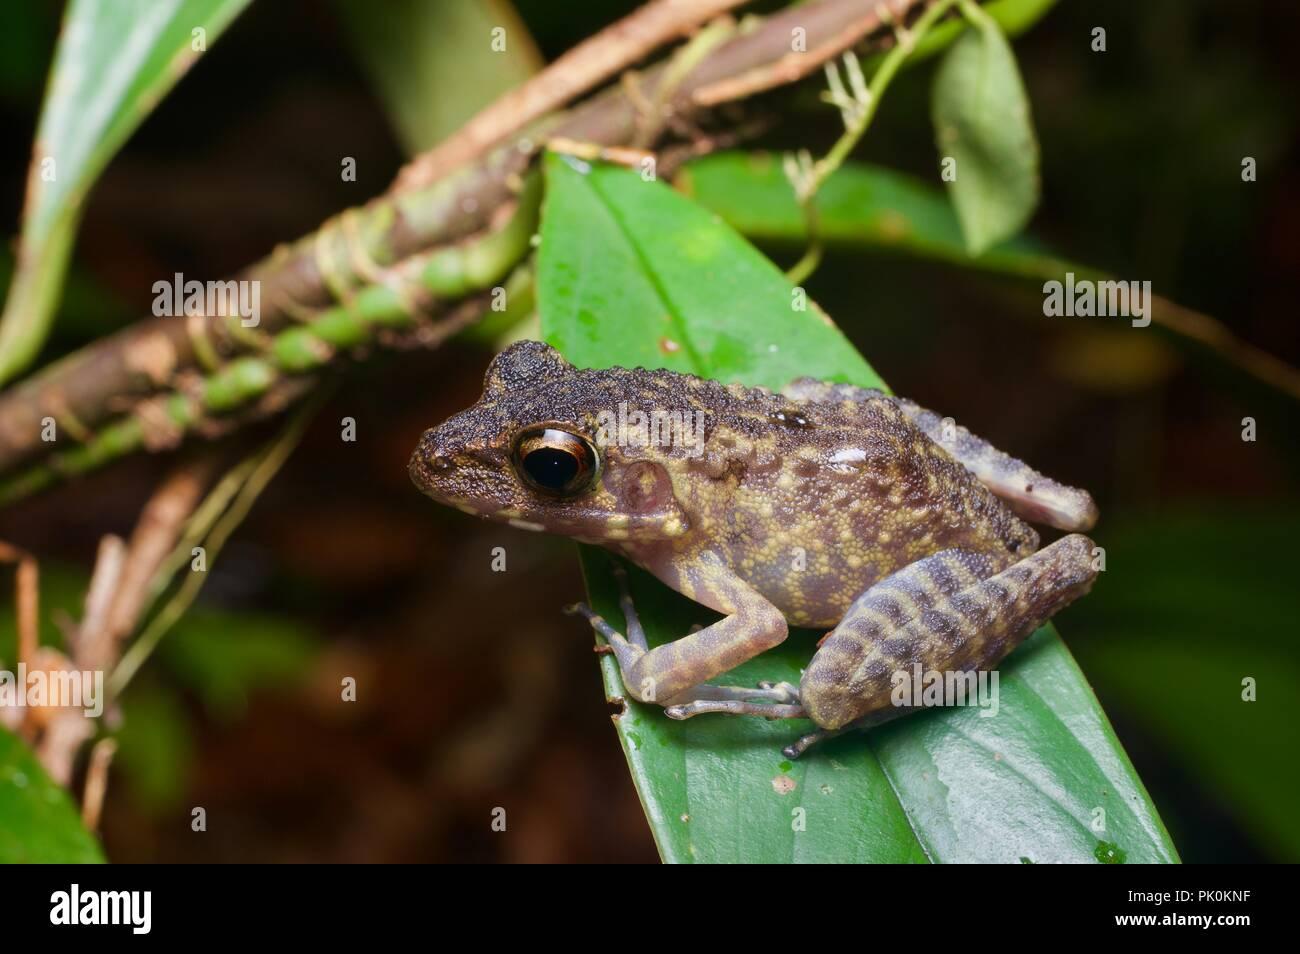 A Brown Marsh Frog (Pulchrana baramica) on a leaf at night in Gunung Mulu National Park, Sarawak, East Malaysia, Borneo - Stock Image